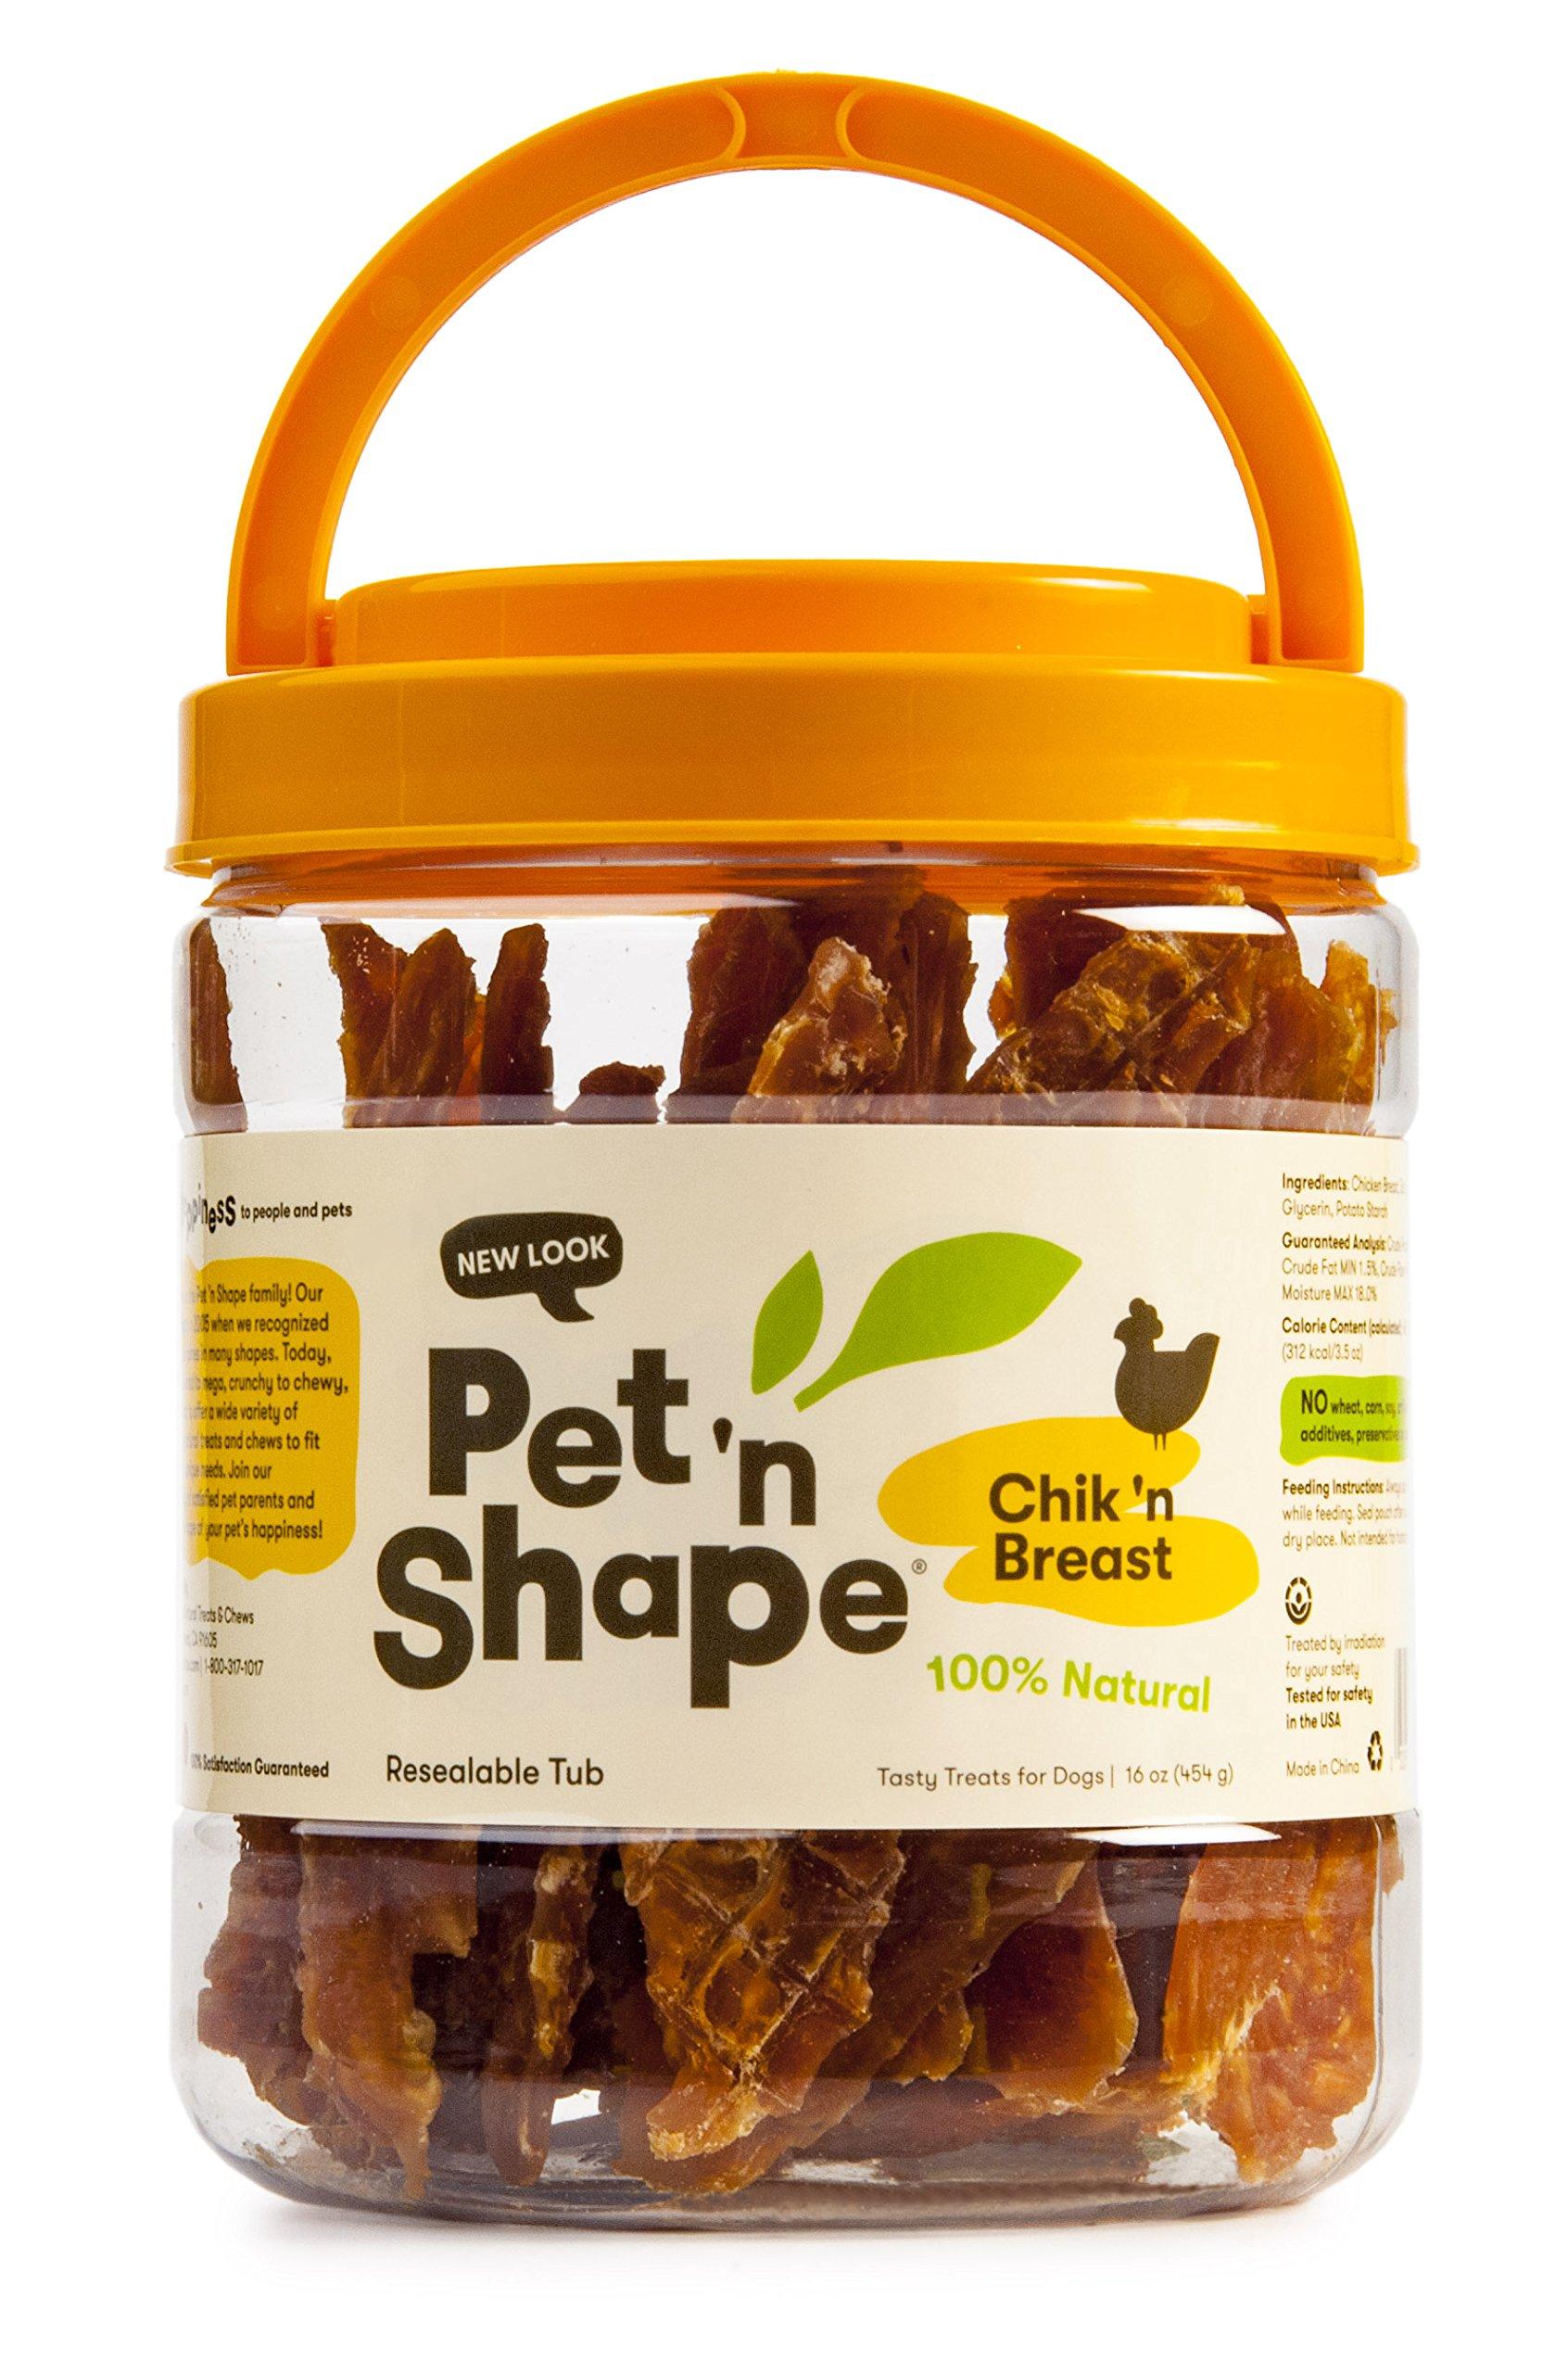 Pet 'n Shape Chik 'n Breast - 100-Percent Natural Chicken Jerky Dog Treats, 1-Pound